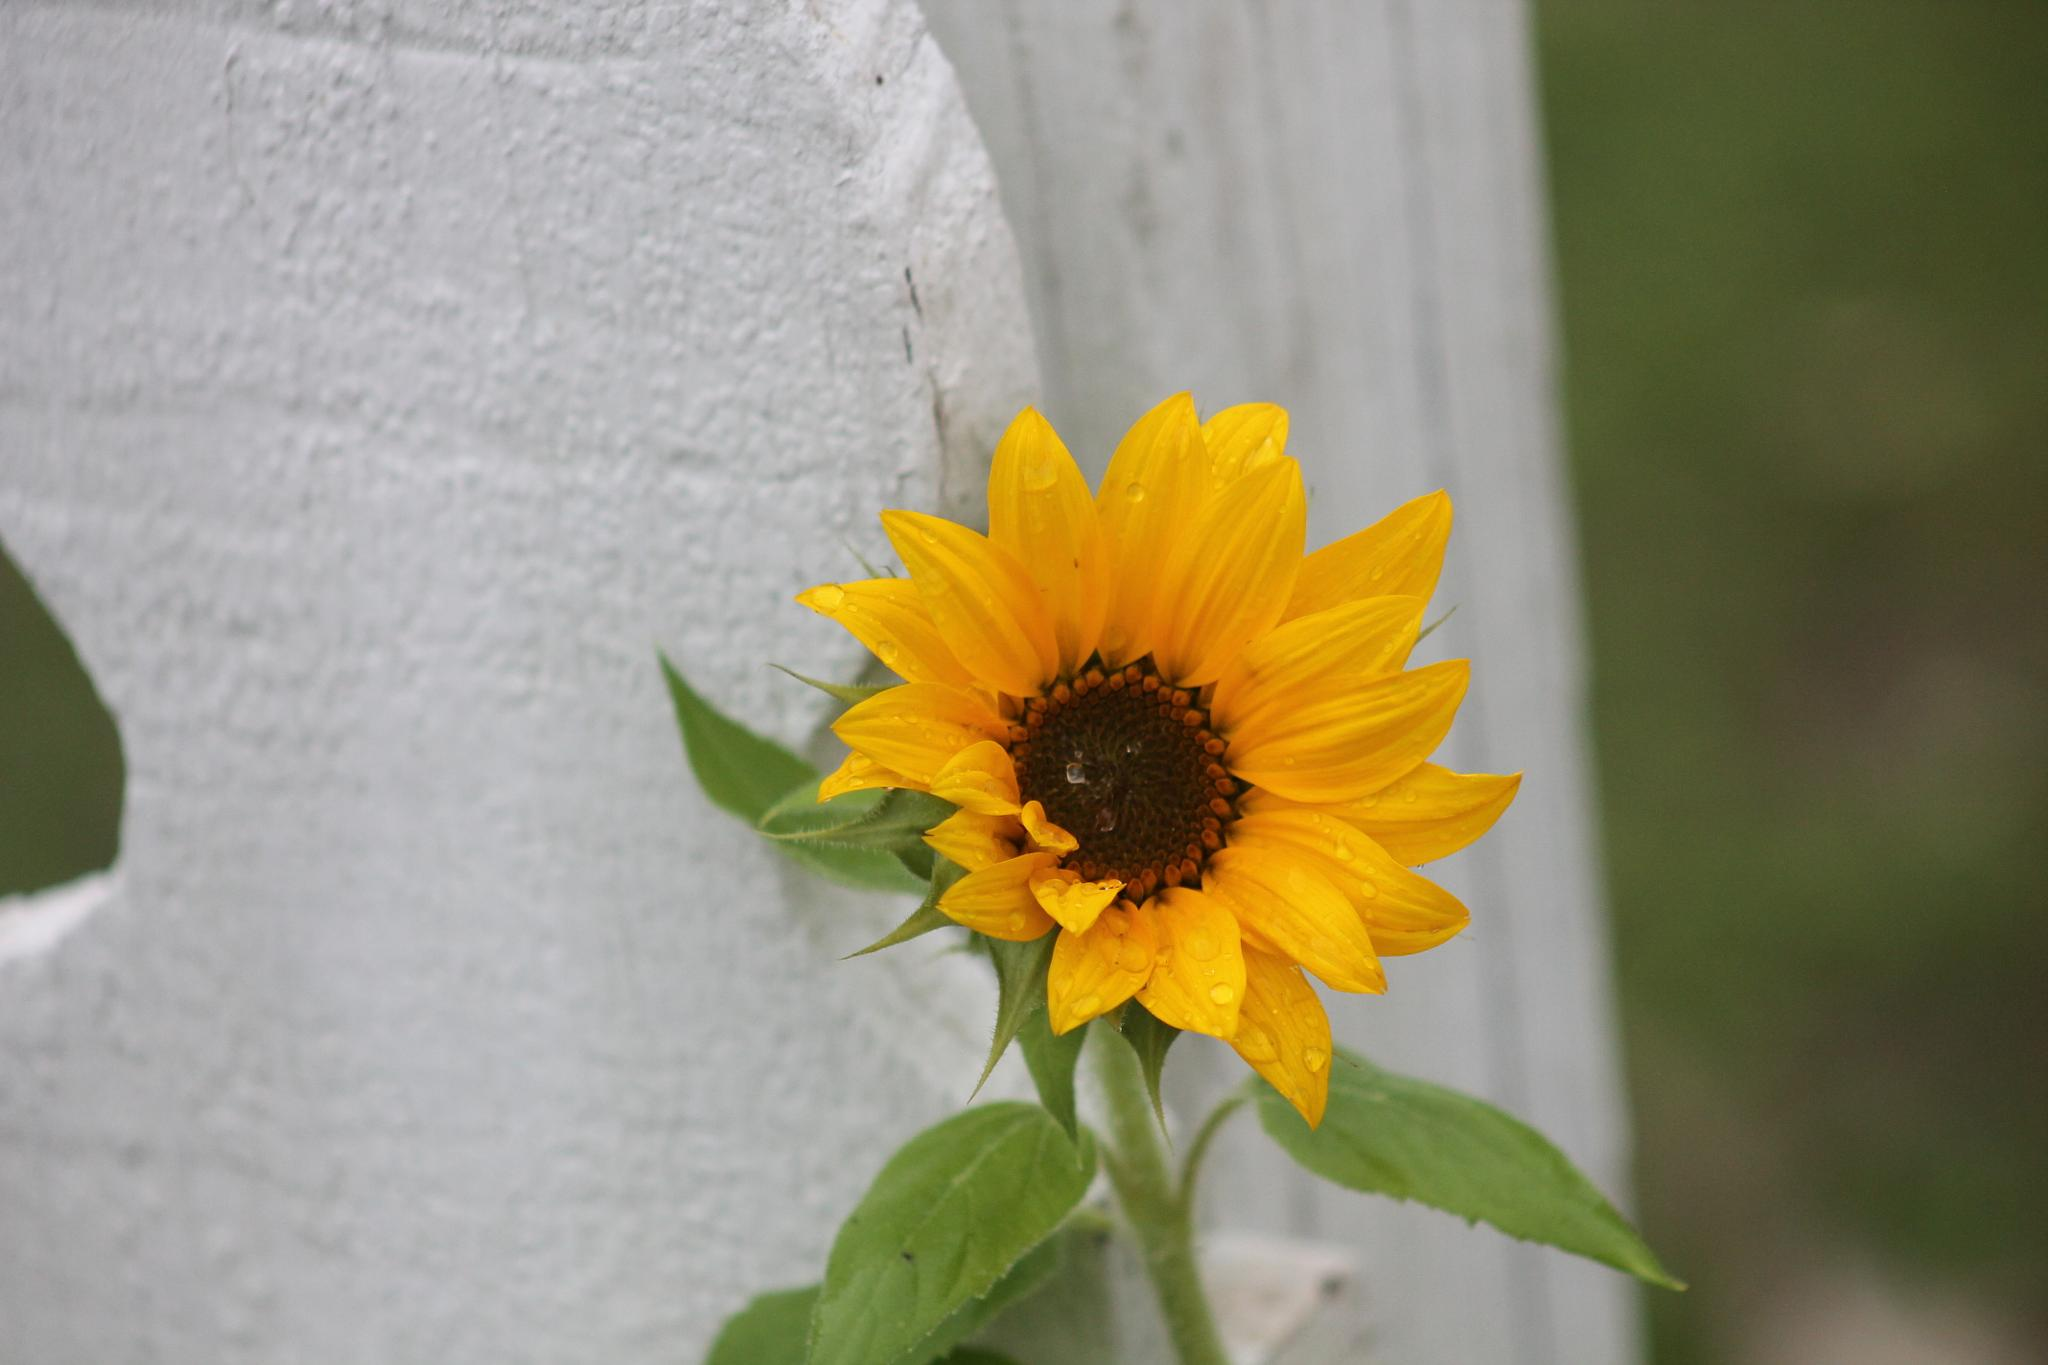 sunflower kisssed by spring rain by terri.blue